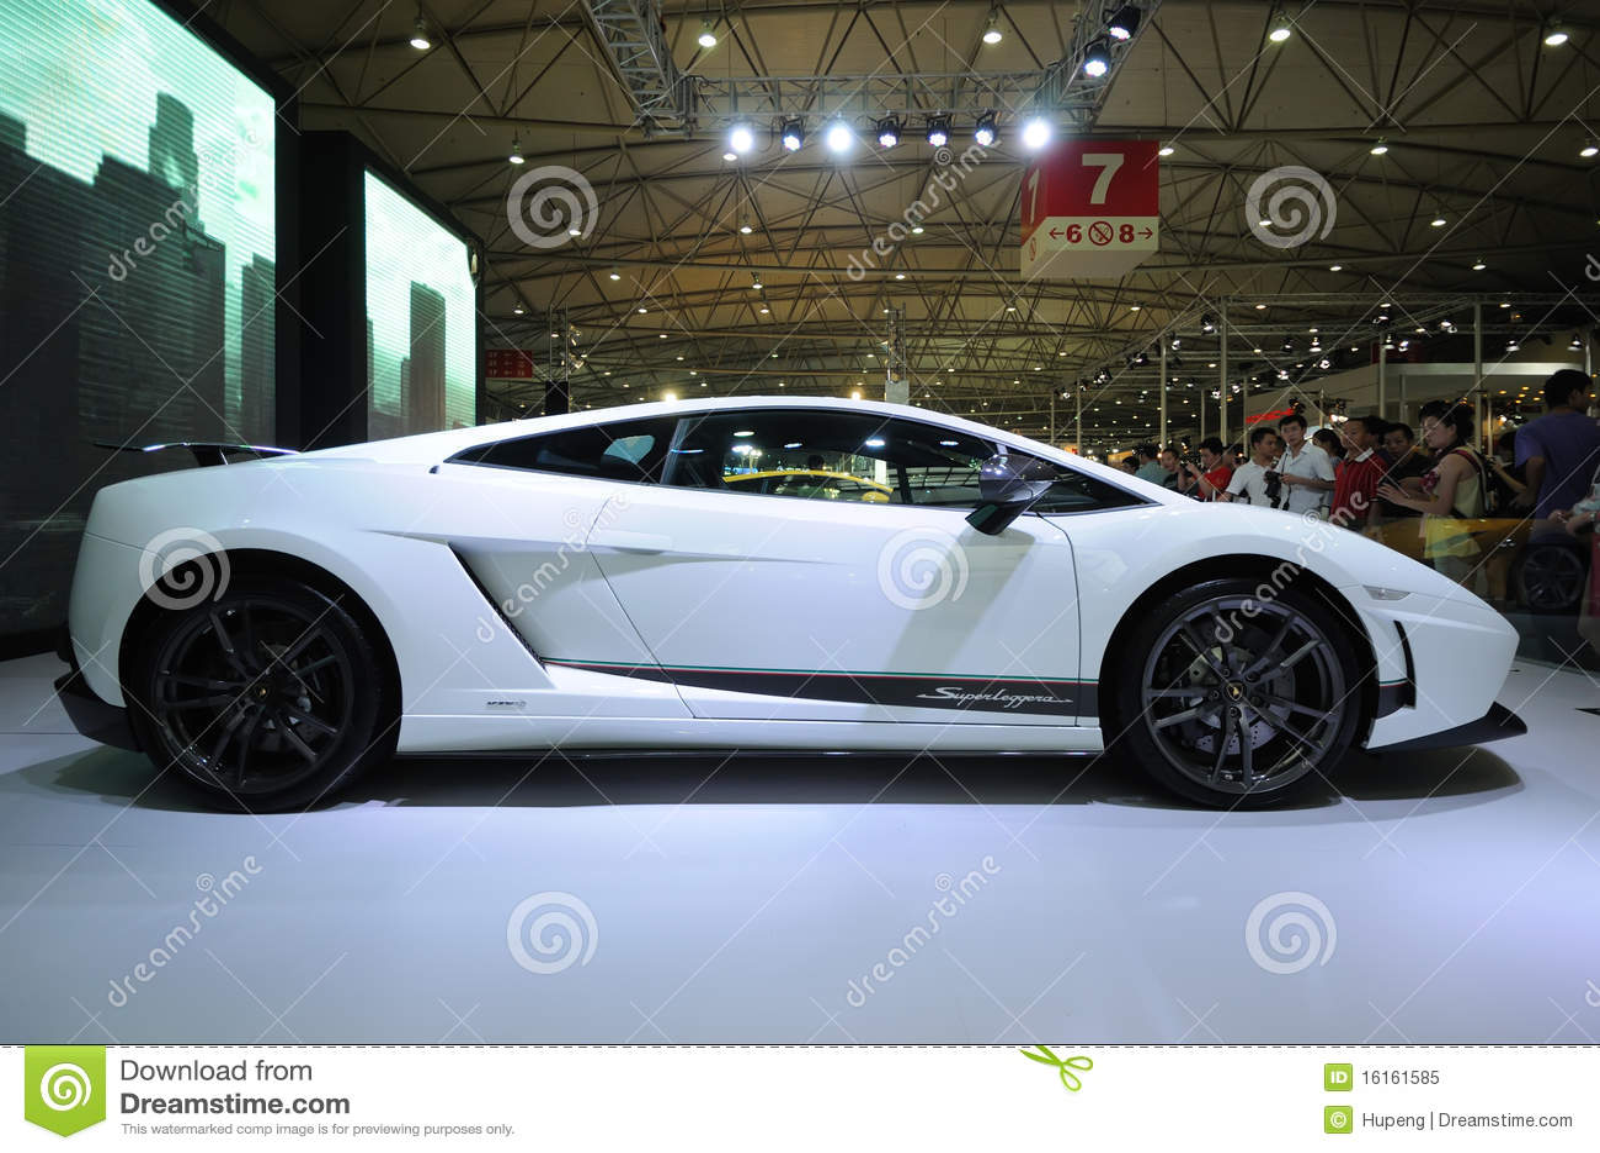 white lamborghini gallardo lp 570 4 superleggera royalty free stock photo